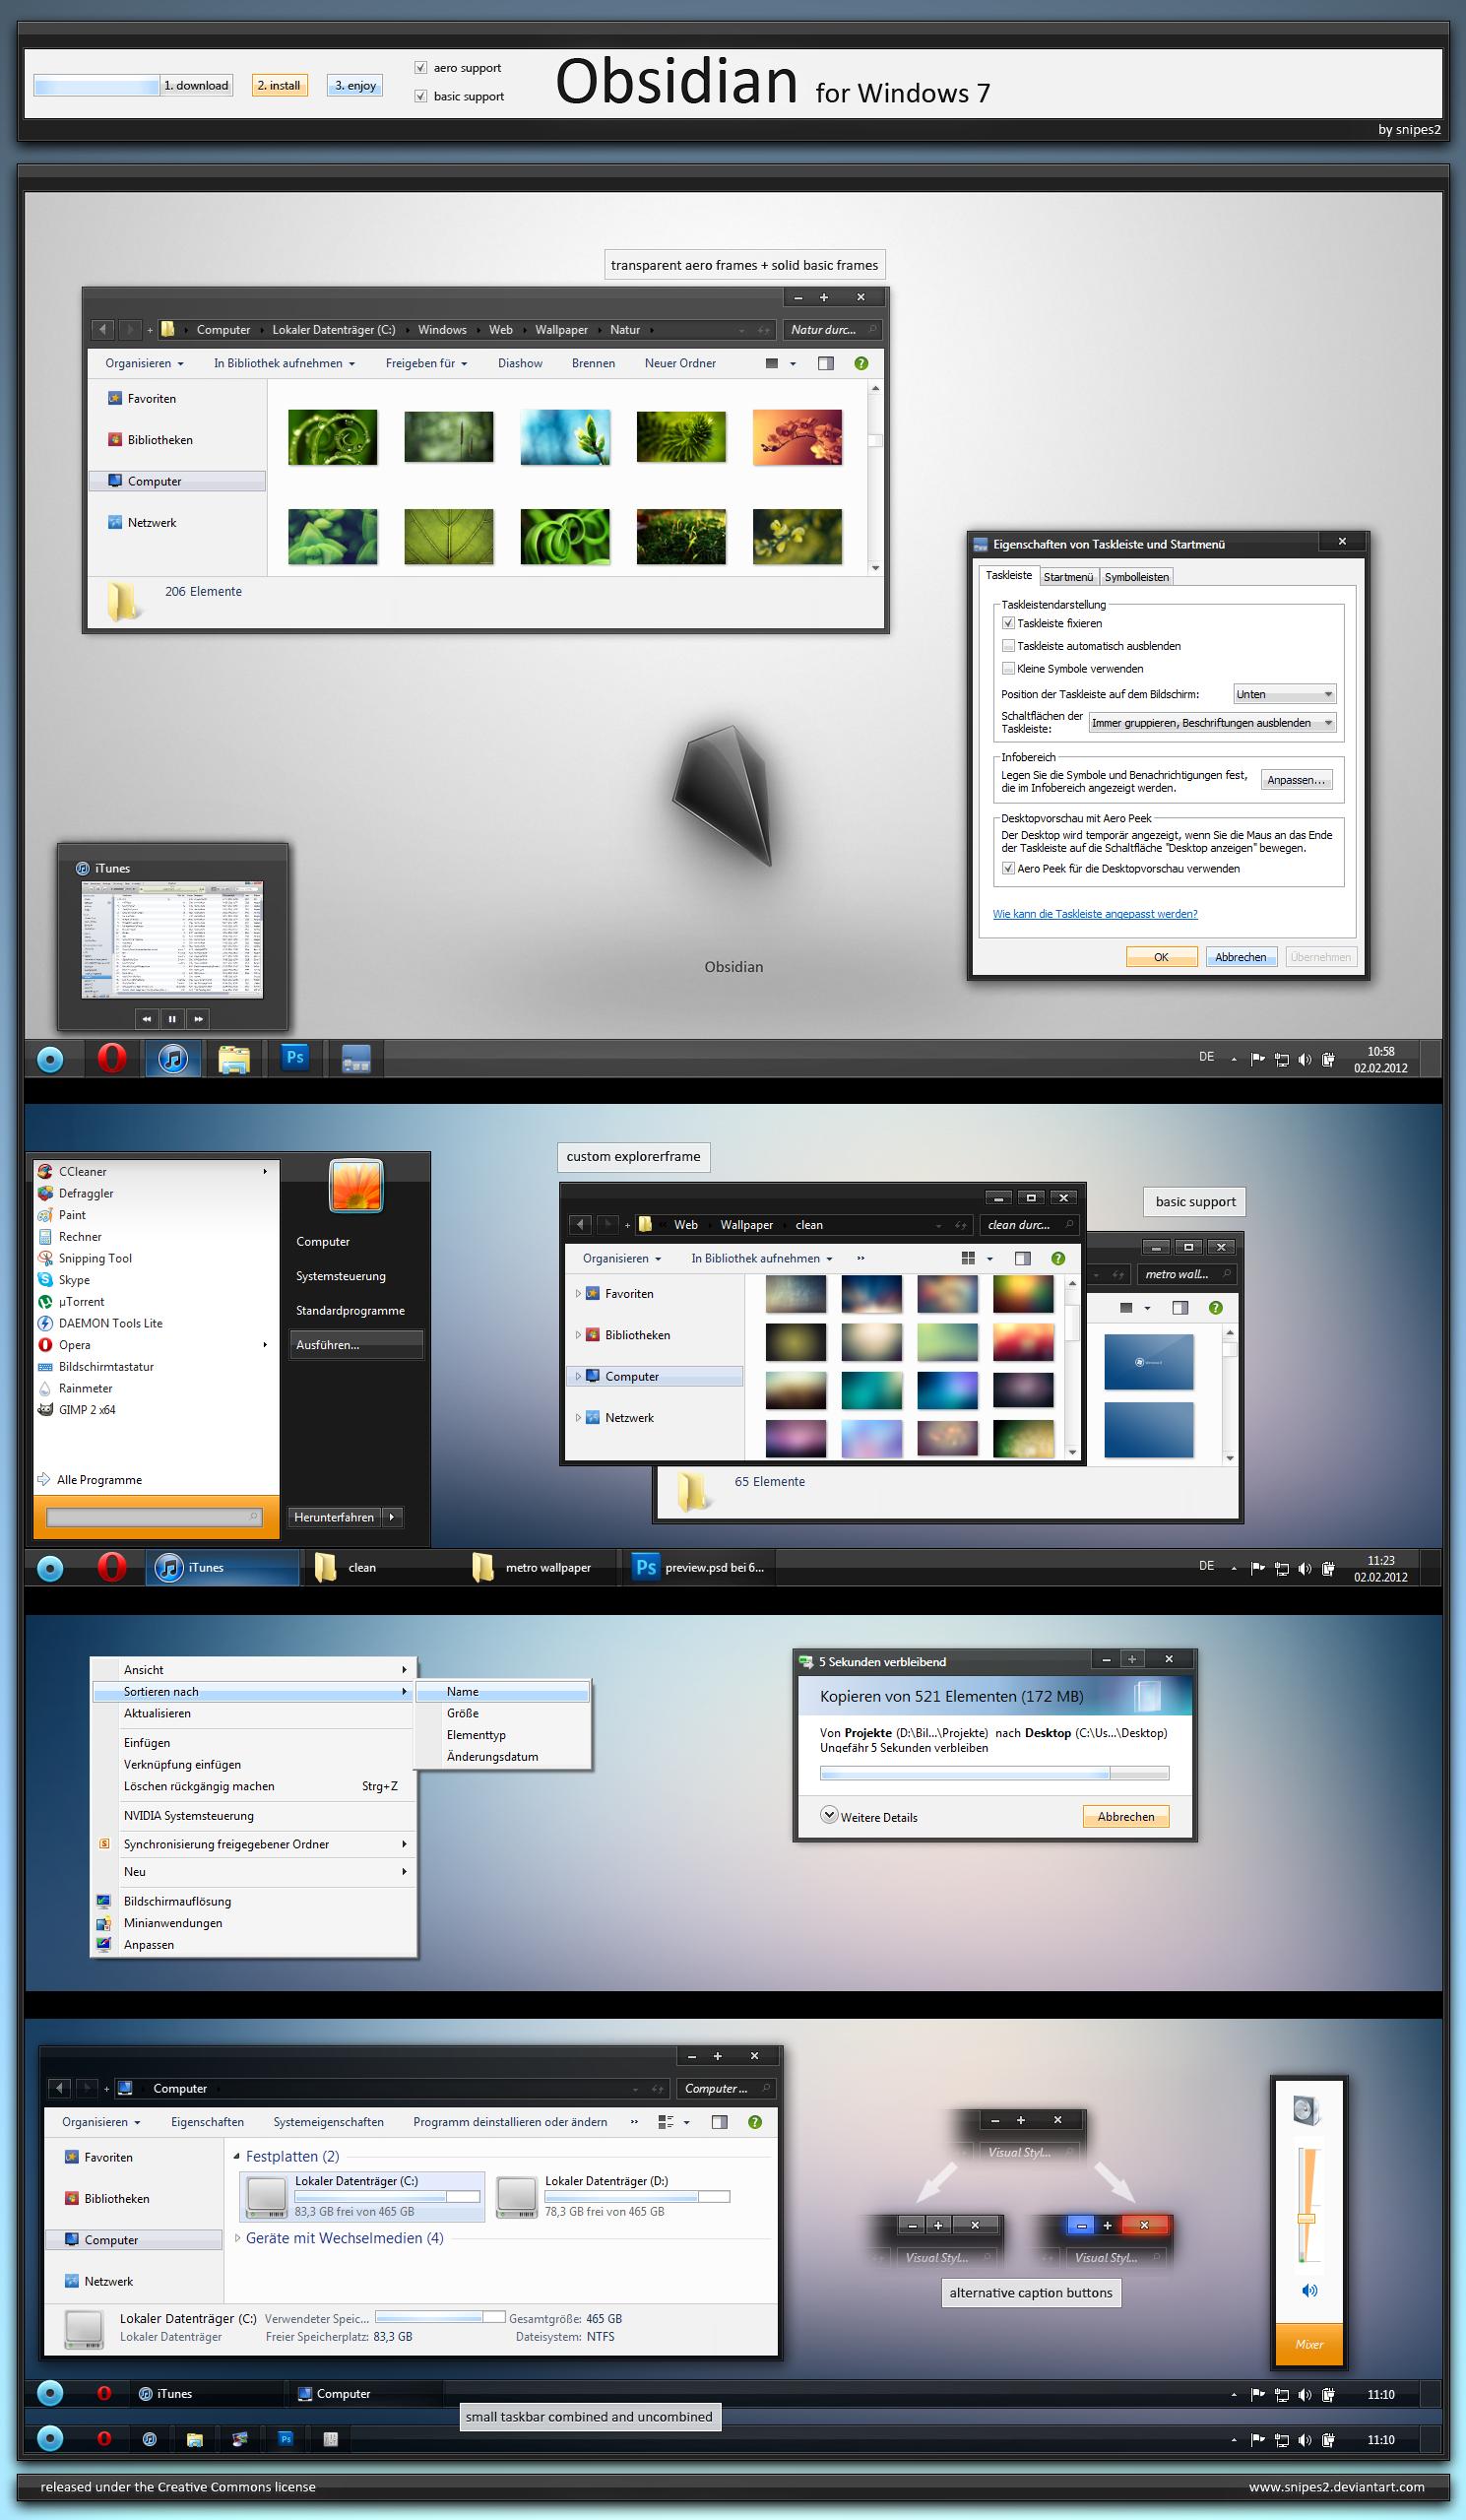 Obsidian for Windows 7 - aero/basic